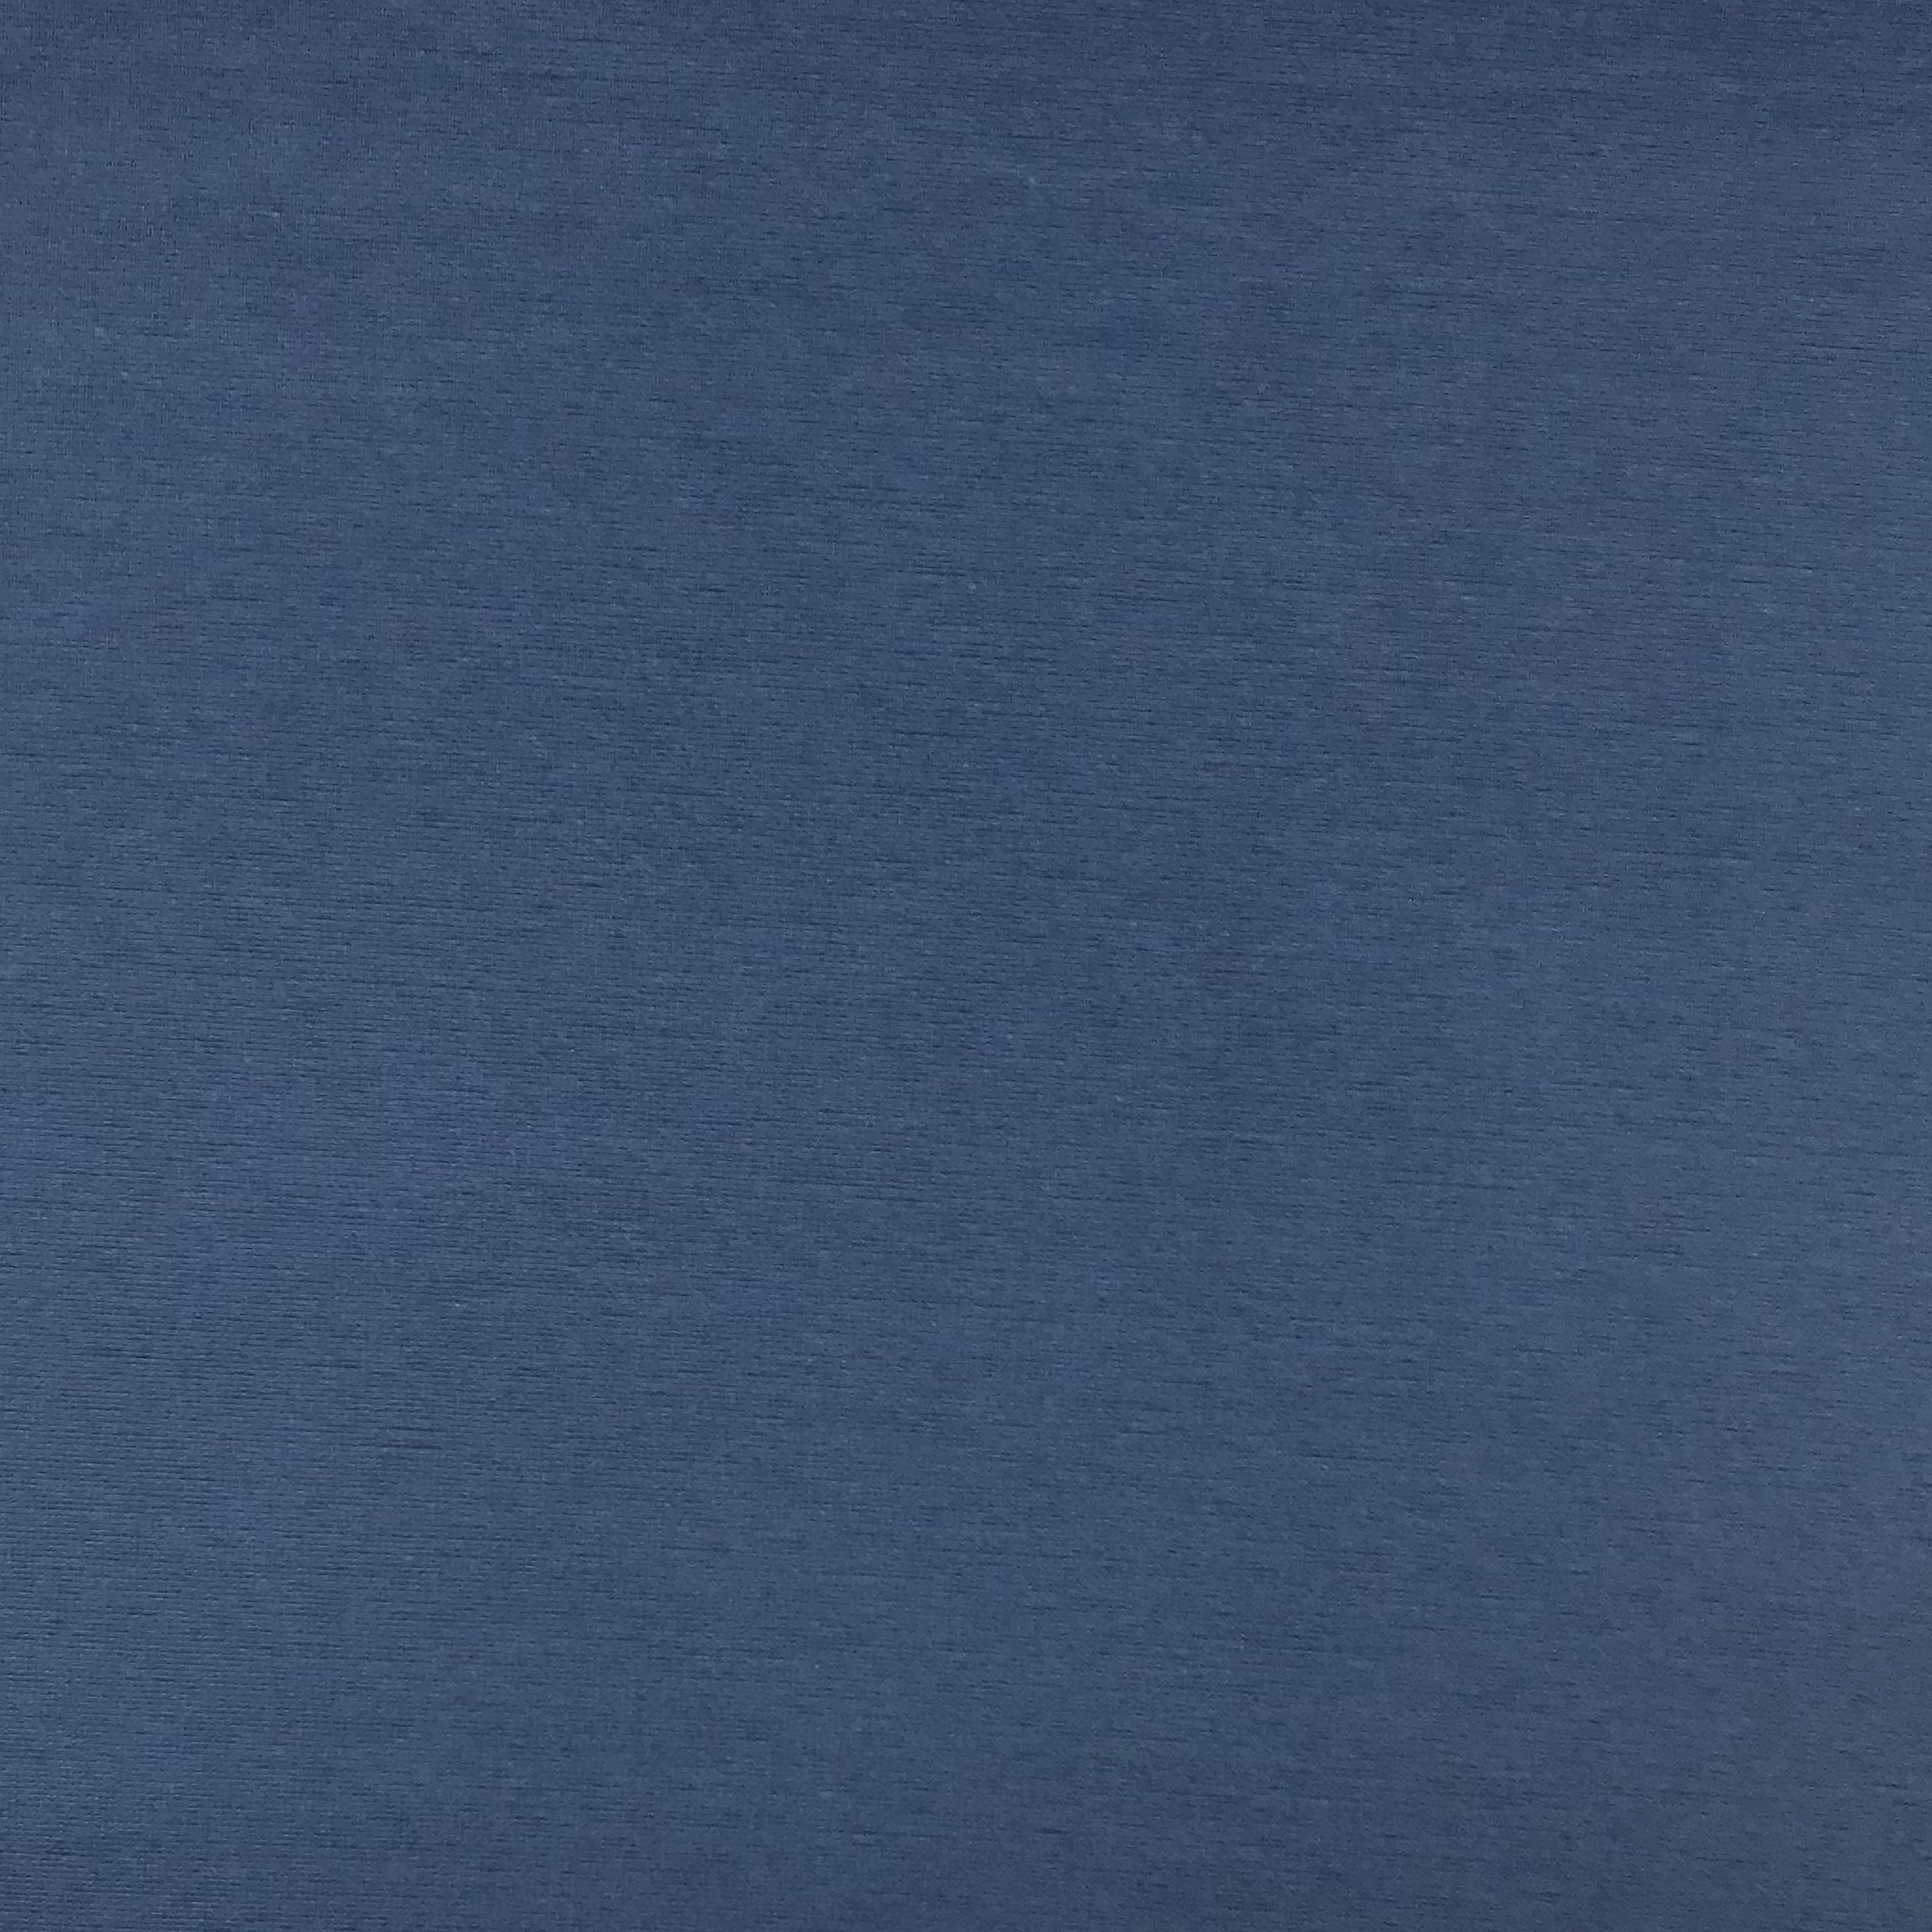 Comfort Romanit Jersey,indigoblau. Art. 13598/006